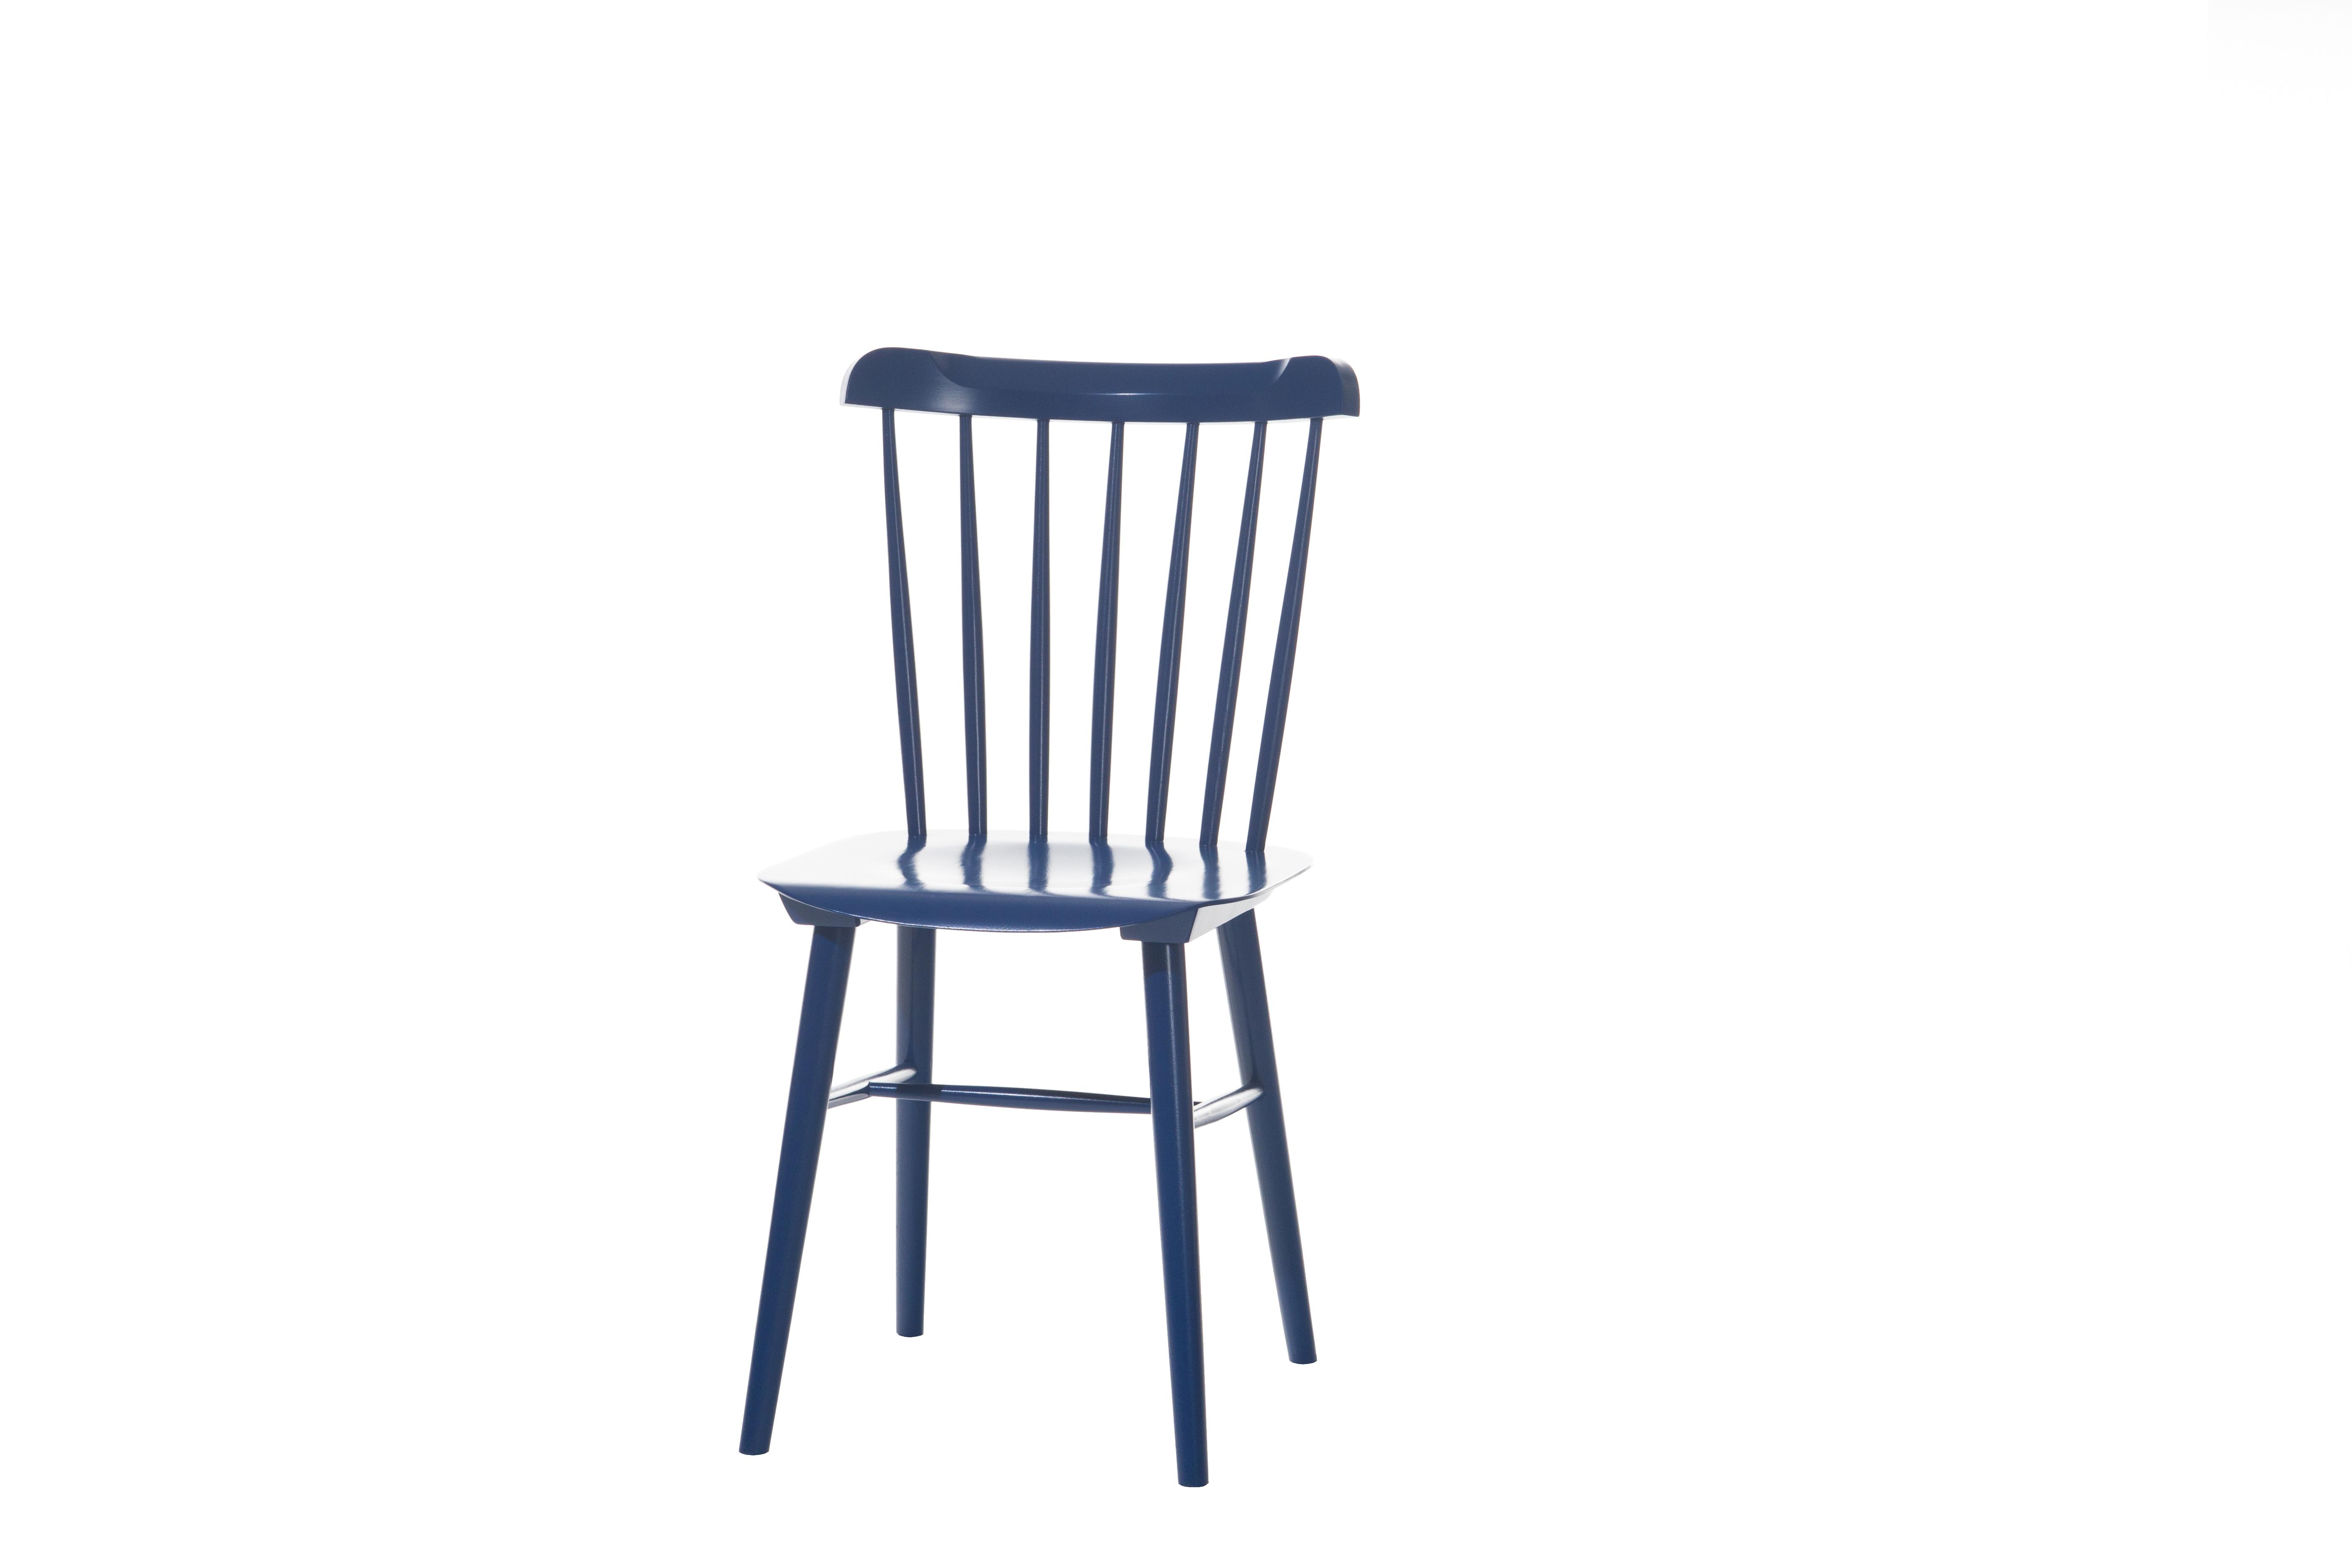 Scaun din lemn de fag Ironica Blue, l44xA47,5xH84,5 cm